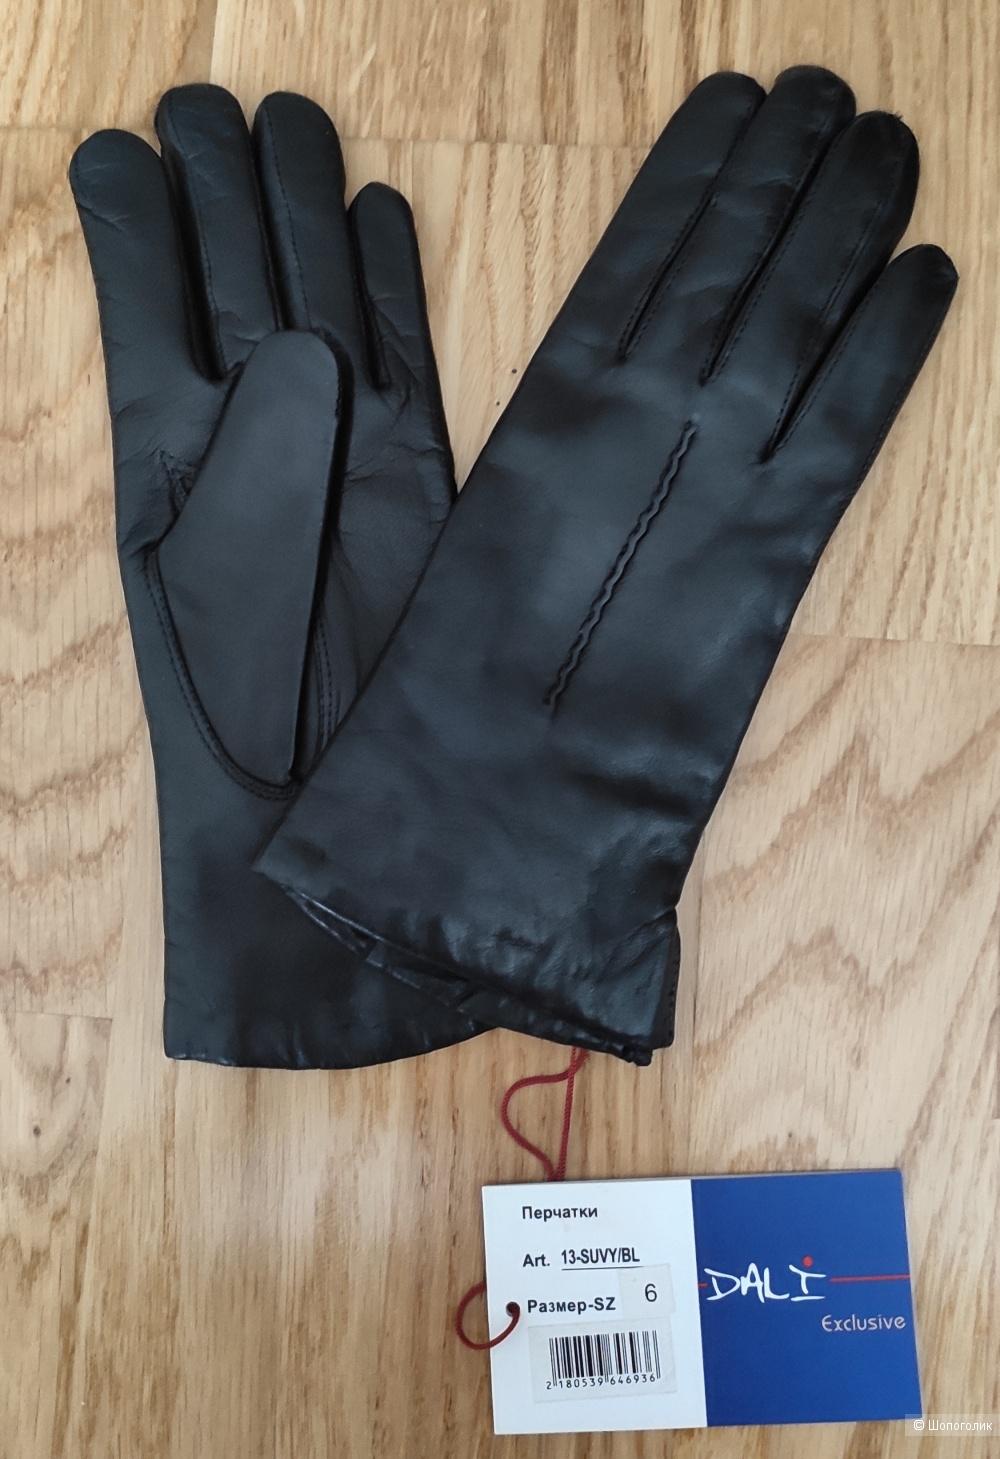 Перчатки DALI Exclusive, 6 р-р